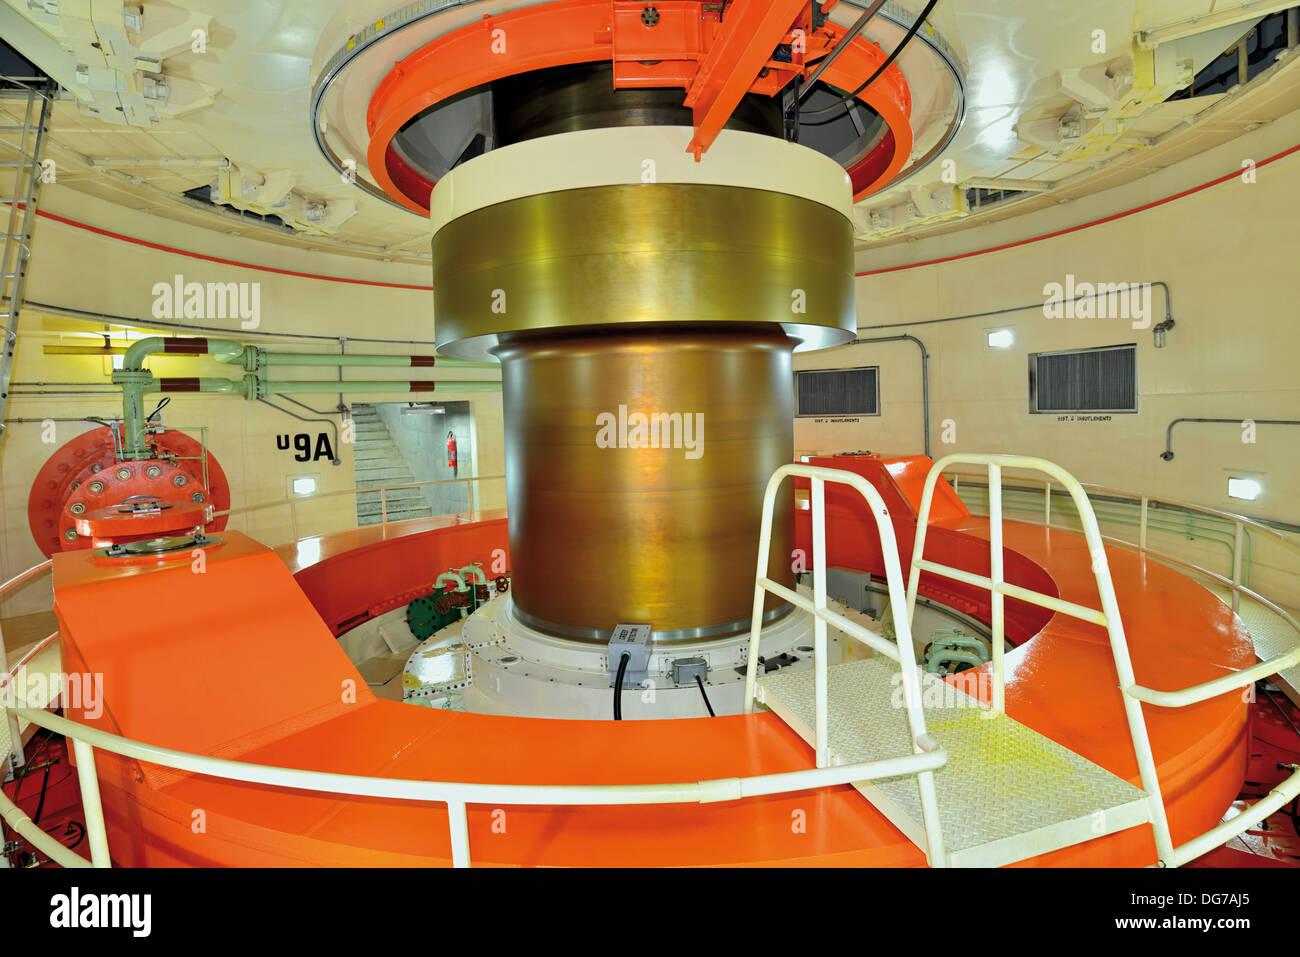 Brazil, Foz do Iguacu: Turbine 9 A is one of the 20 turbines producing 700 Megawatts each of Itaipú Dam - Stock Image